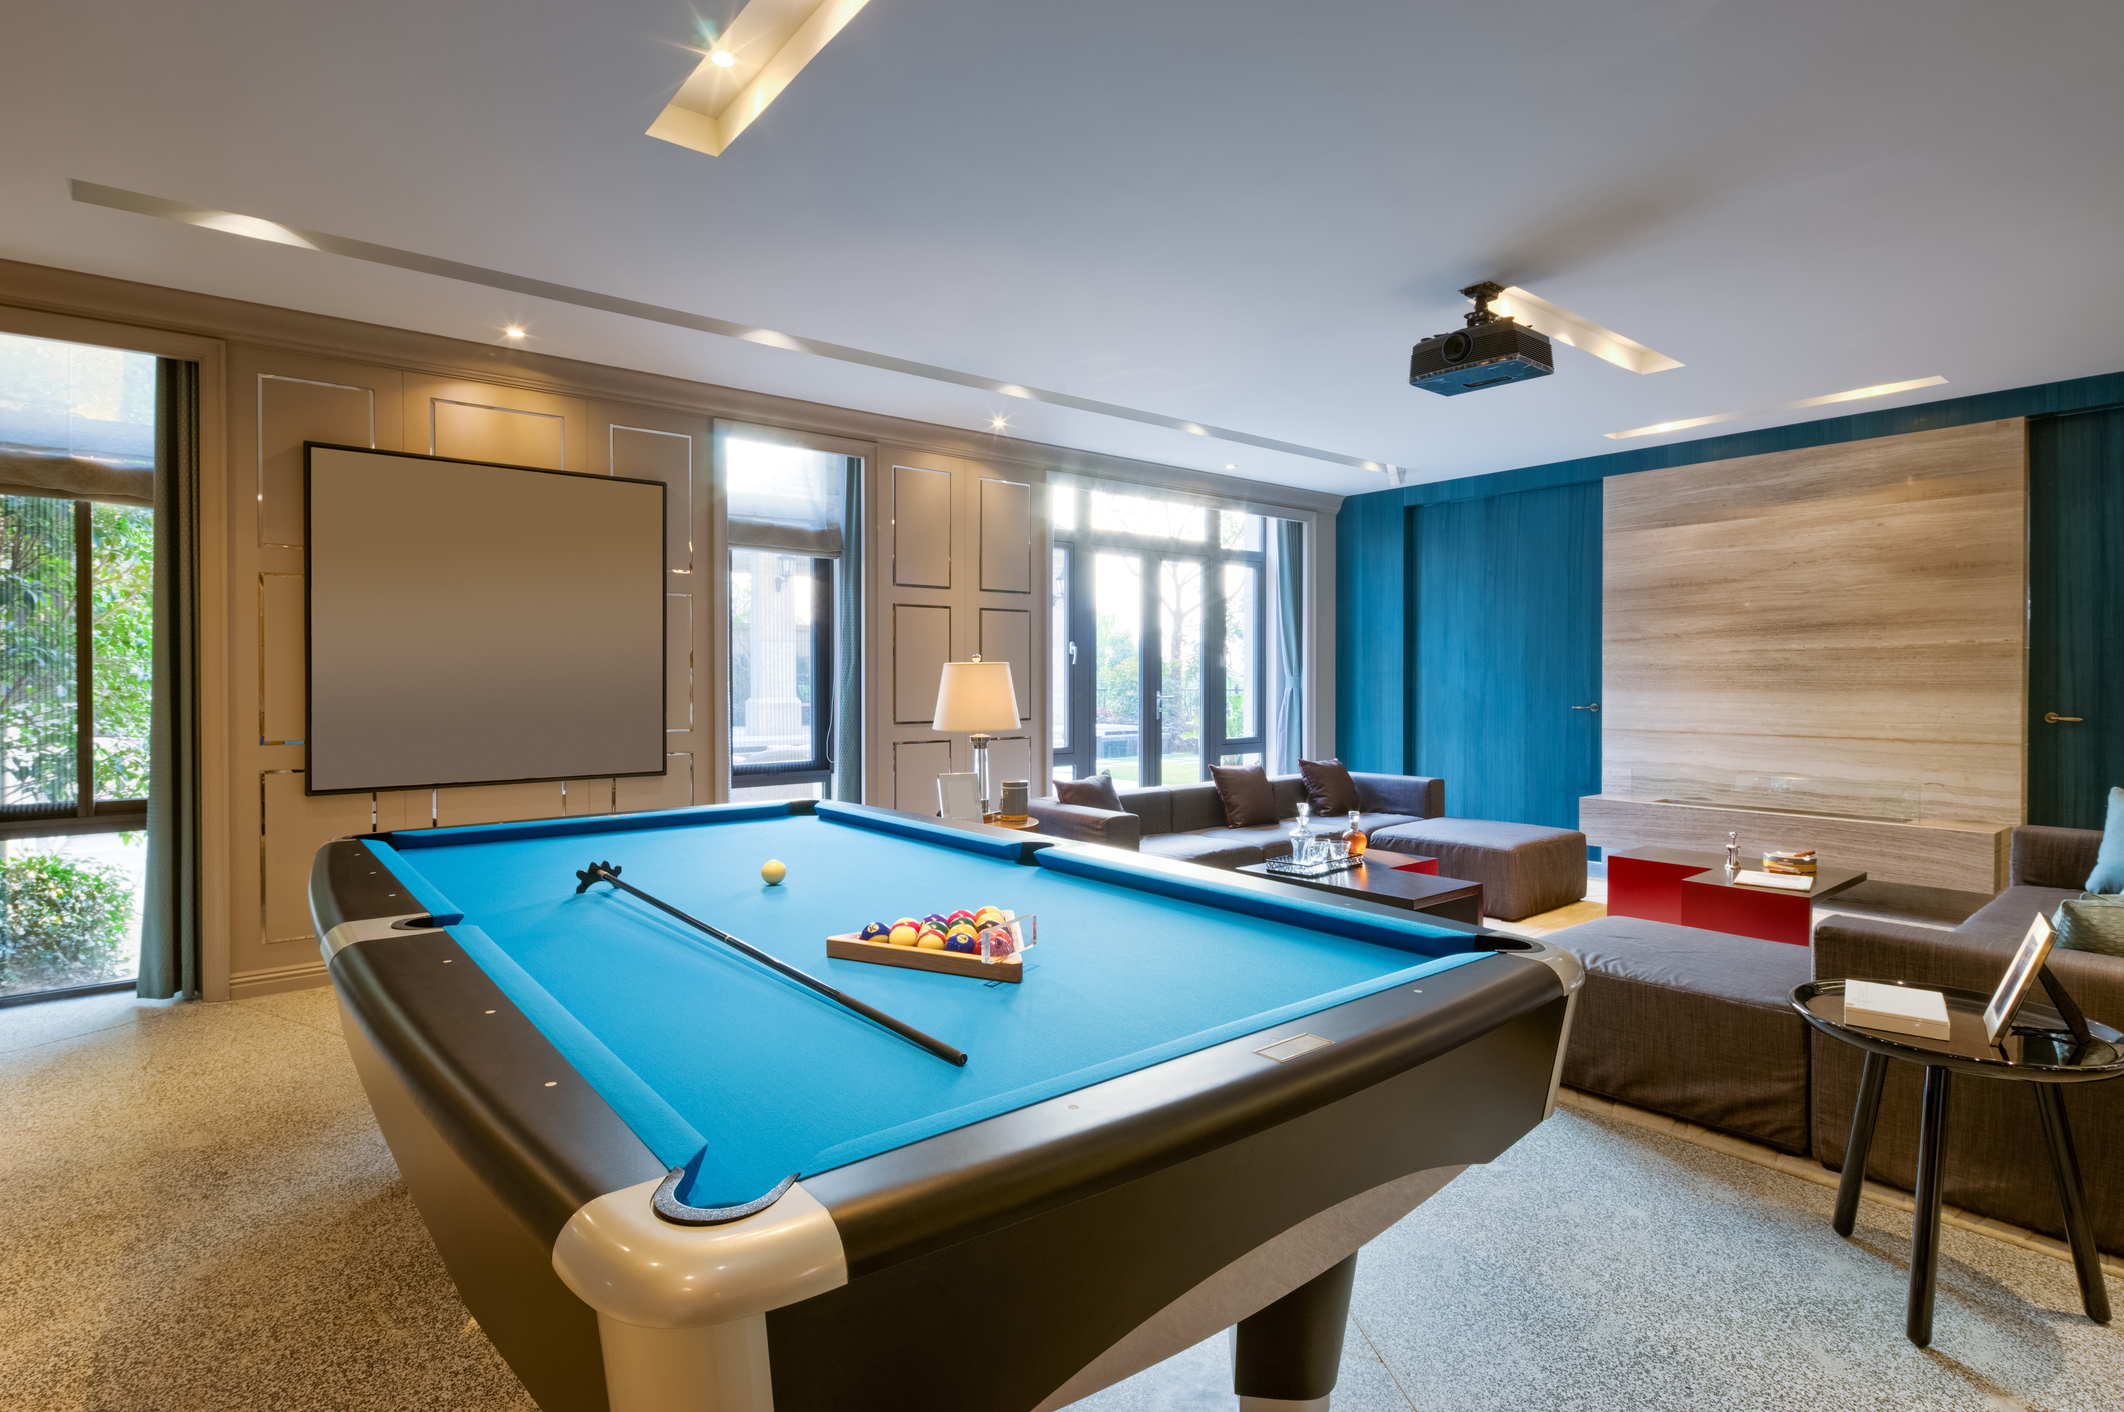 Pool table in modern game room.